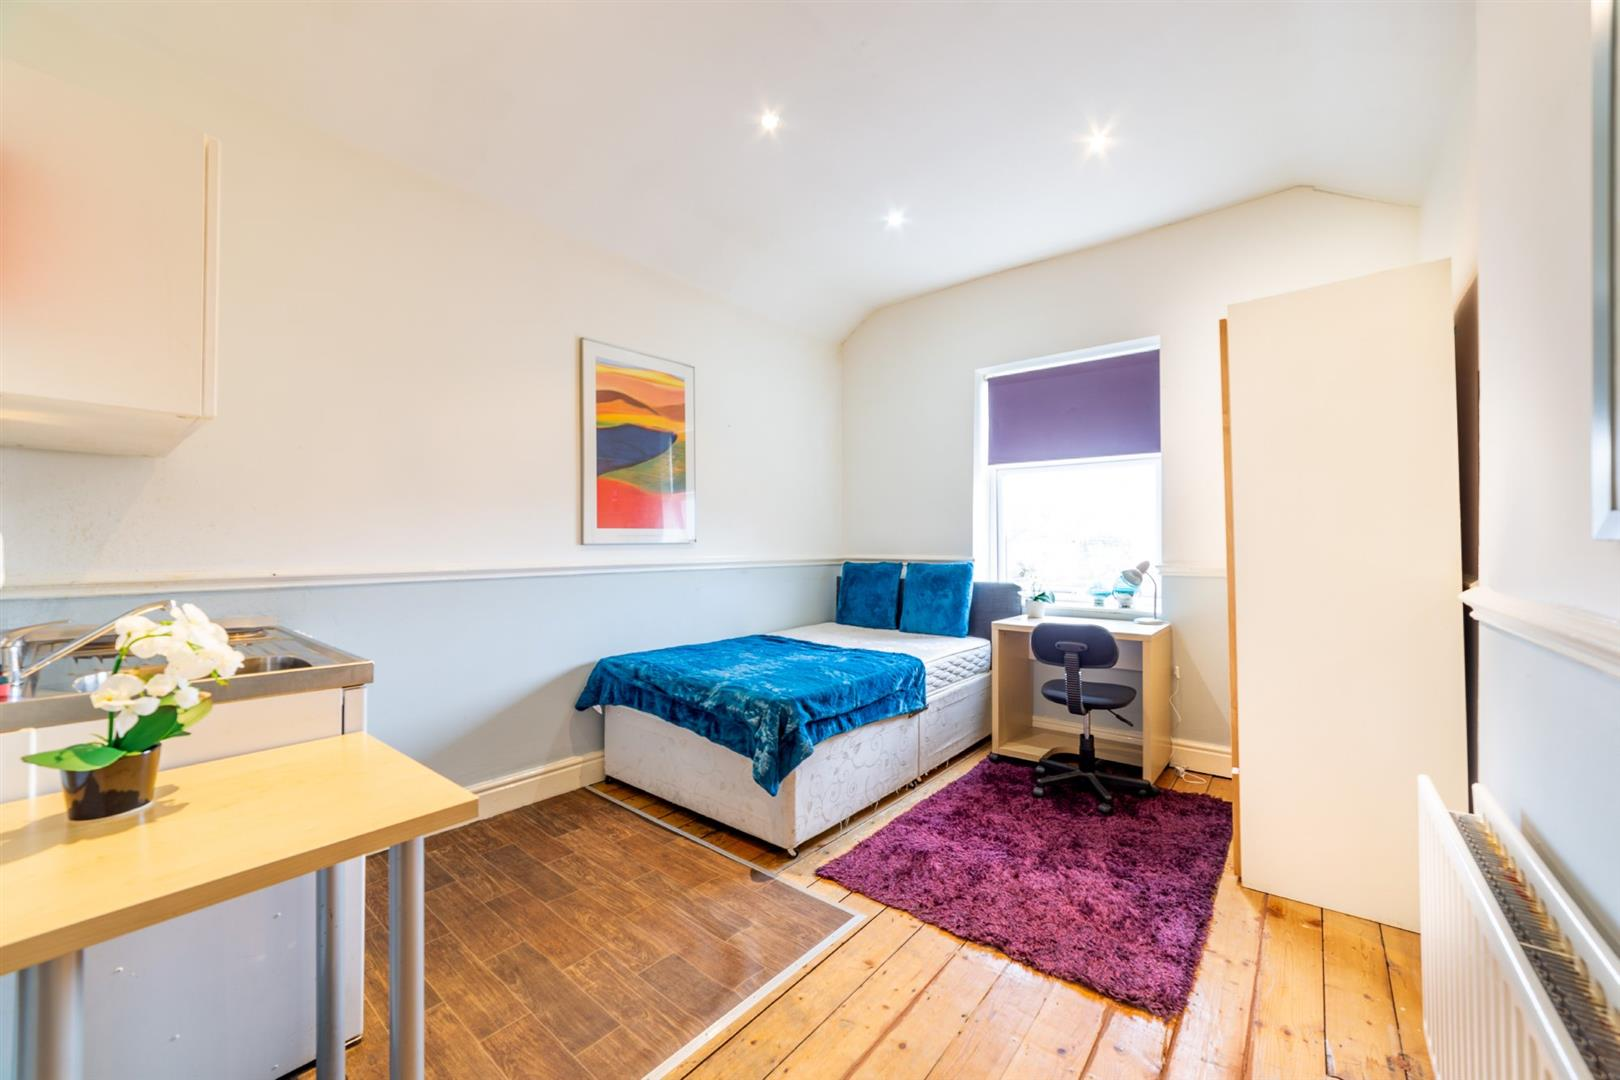 1 bed studio flat to rent in Newcastle Upon Tyne, NE4 6AQ - Property Image 1